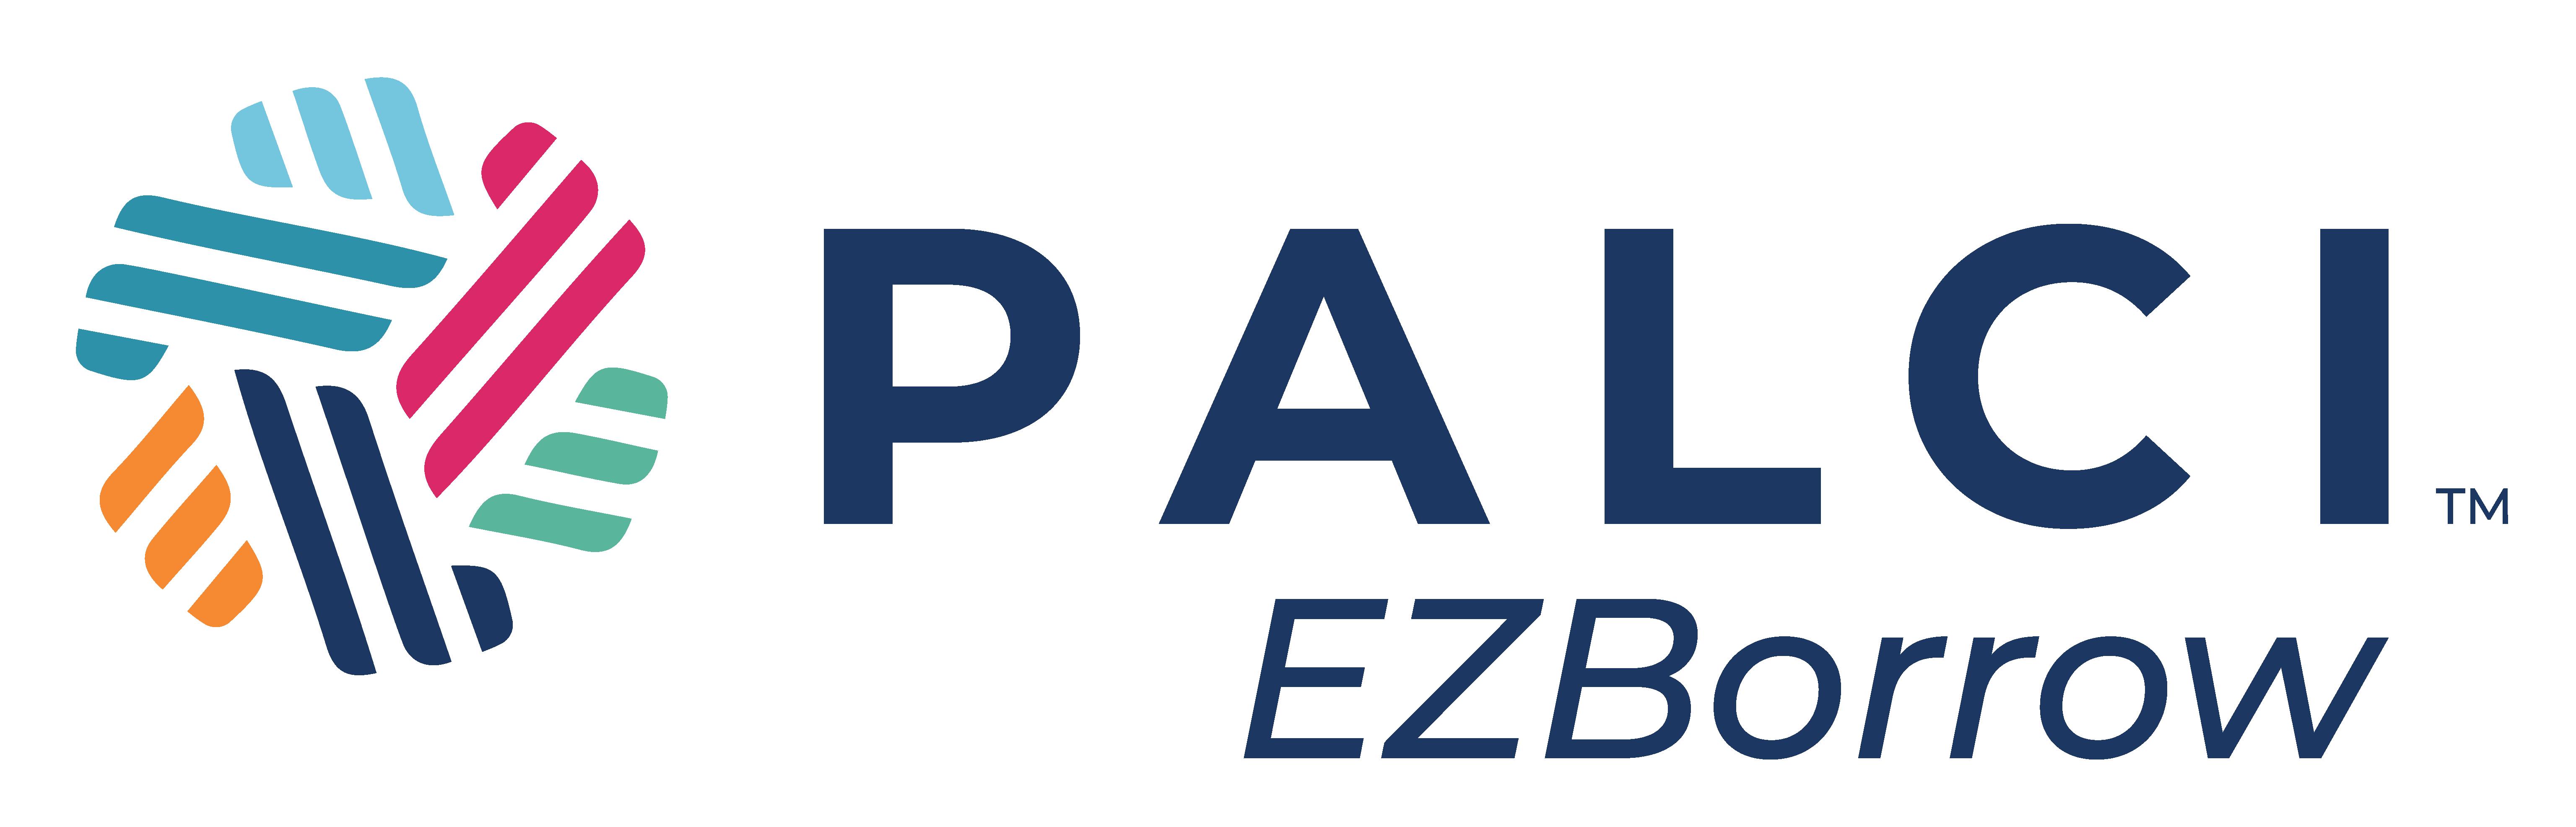 PALCI EZBorrow Logo